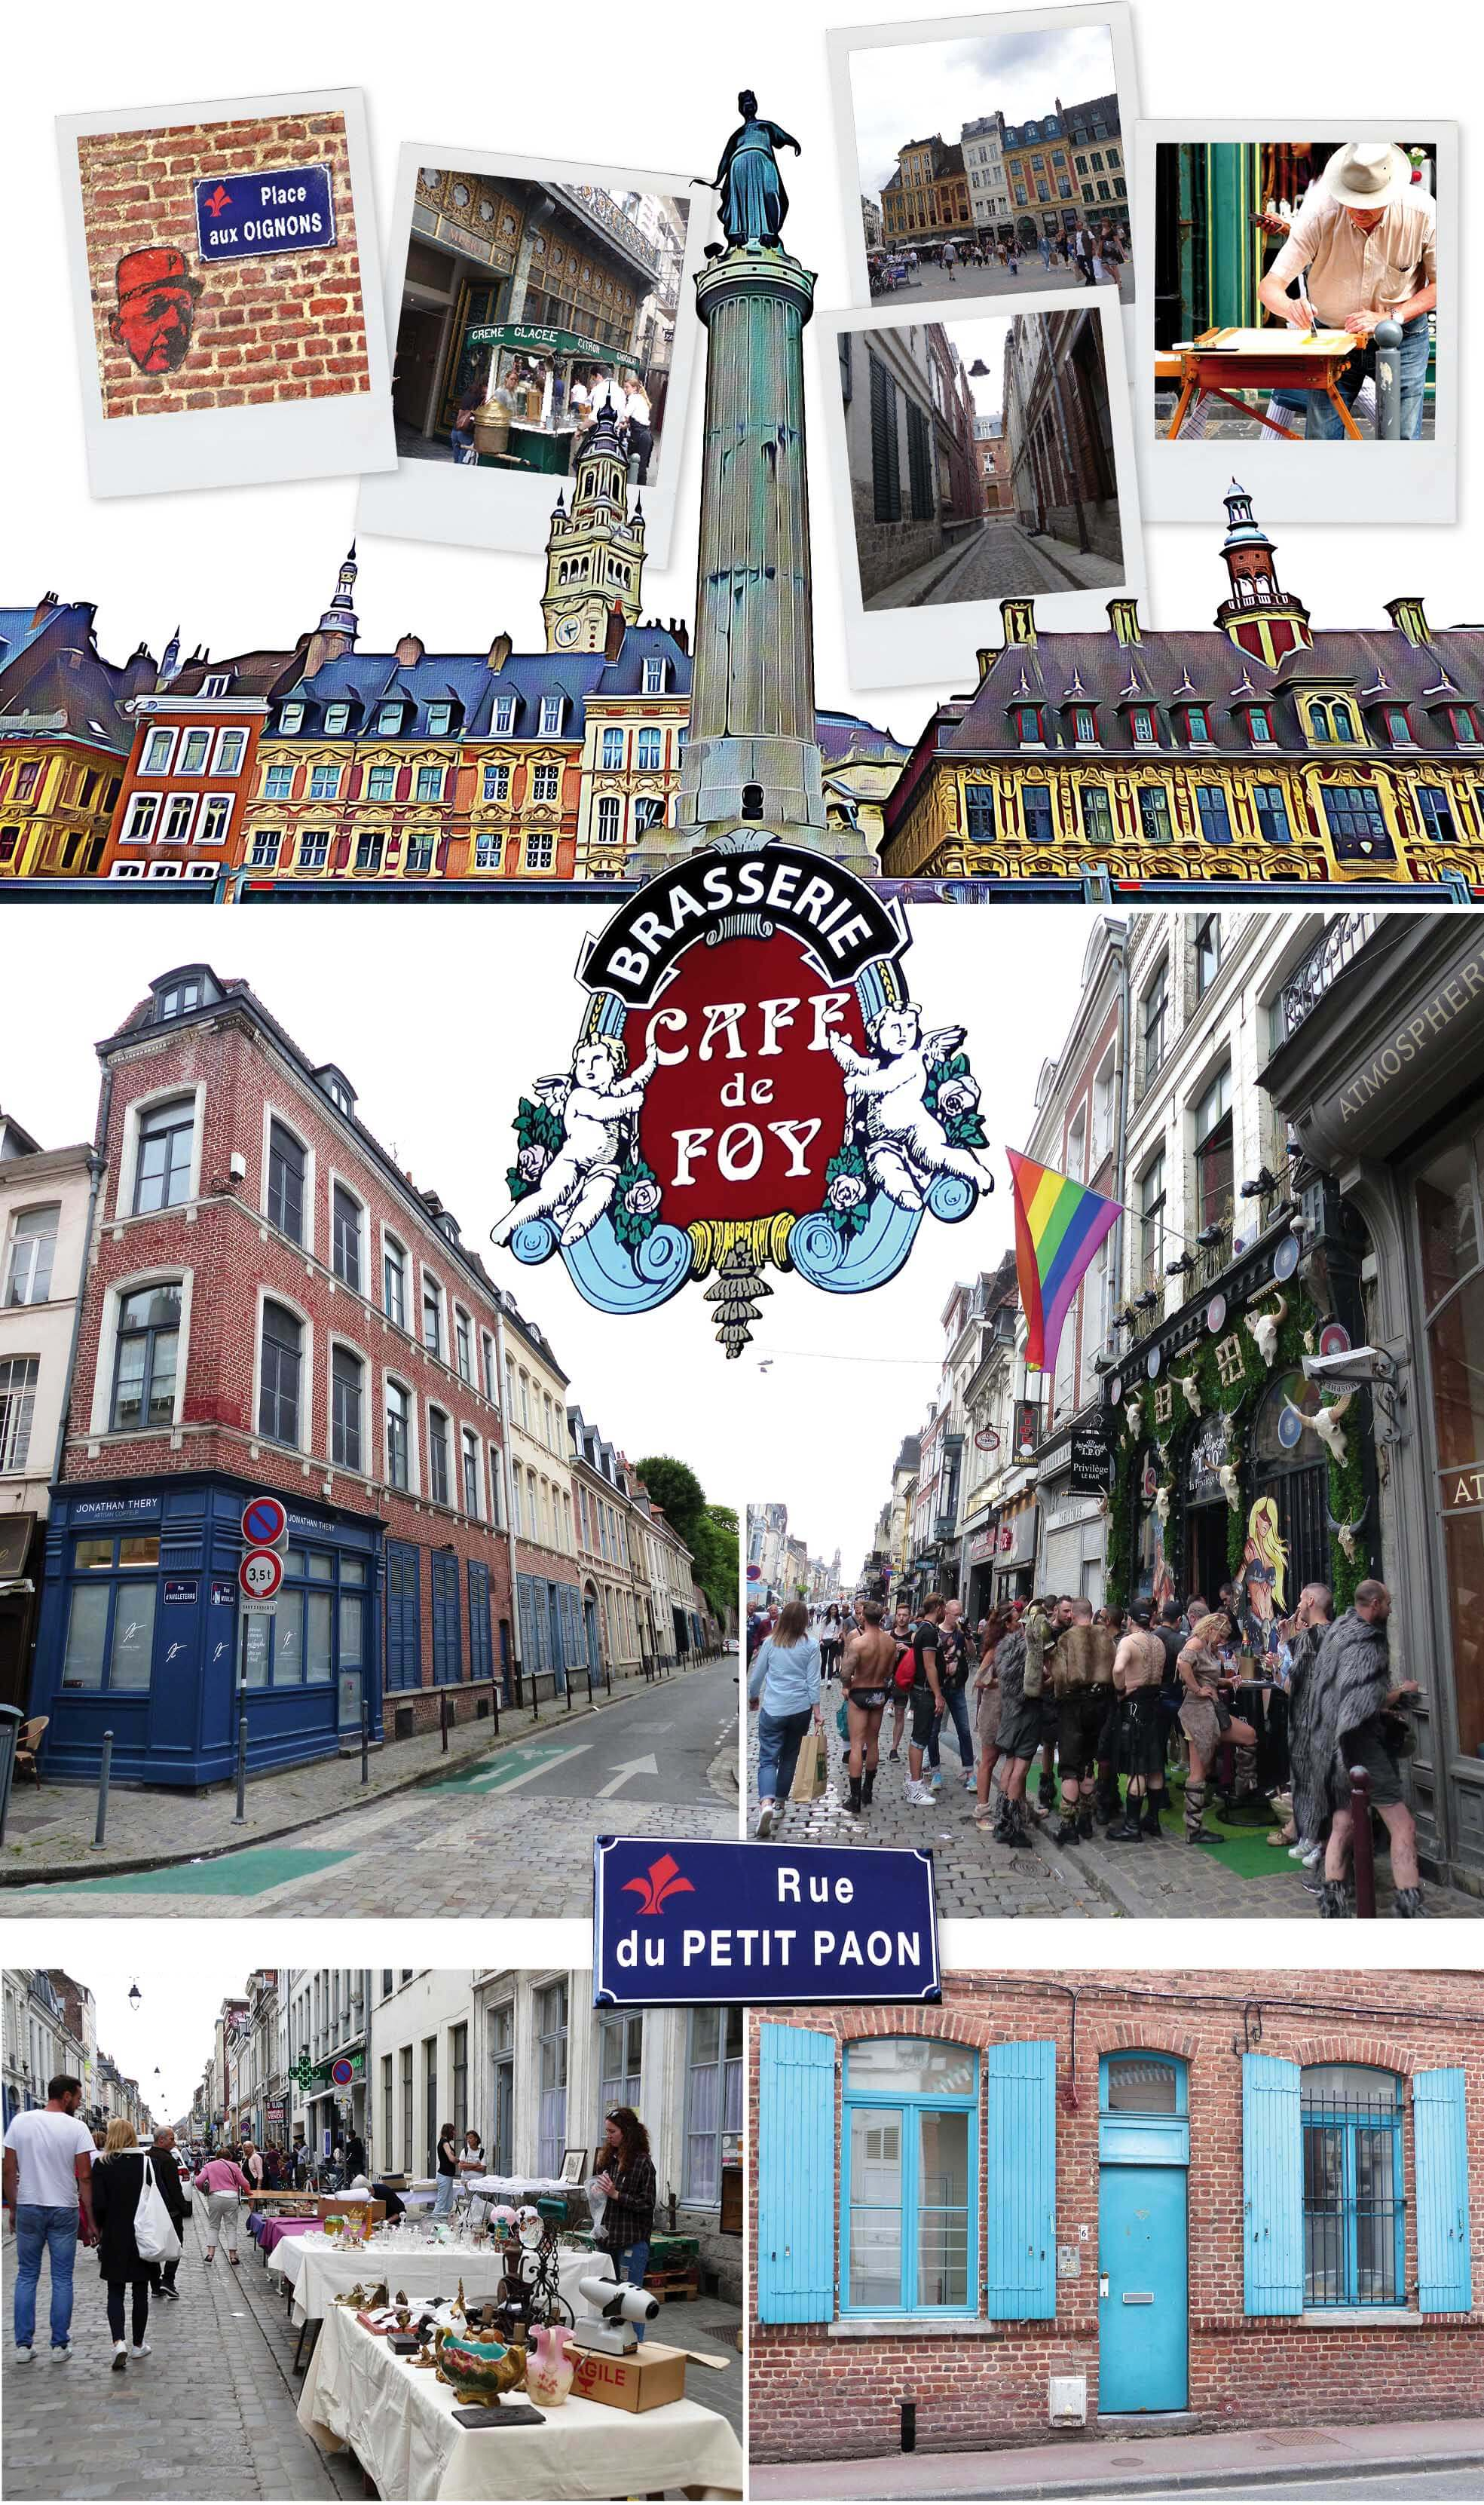 europe, France, road trip, voyage, ville, capitale, briques, lille, nord, grande place, artiste, brocante, brasserie, rue